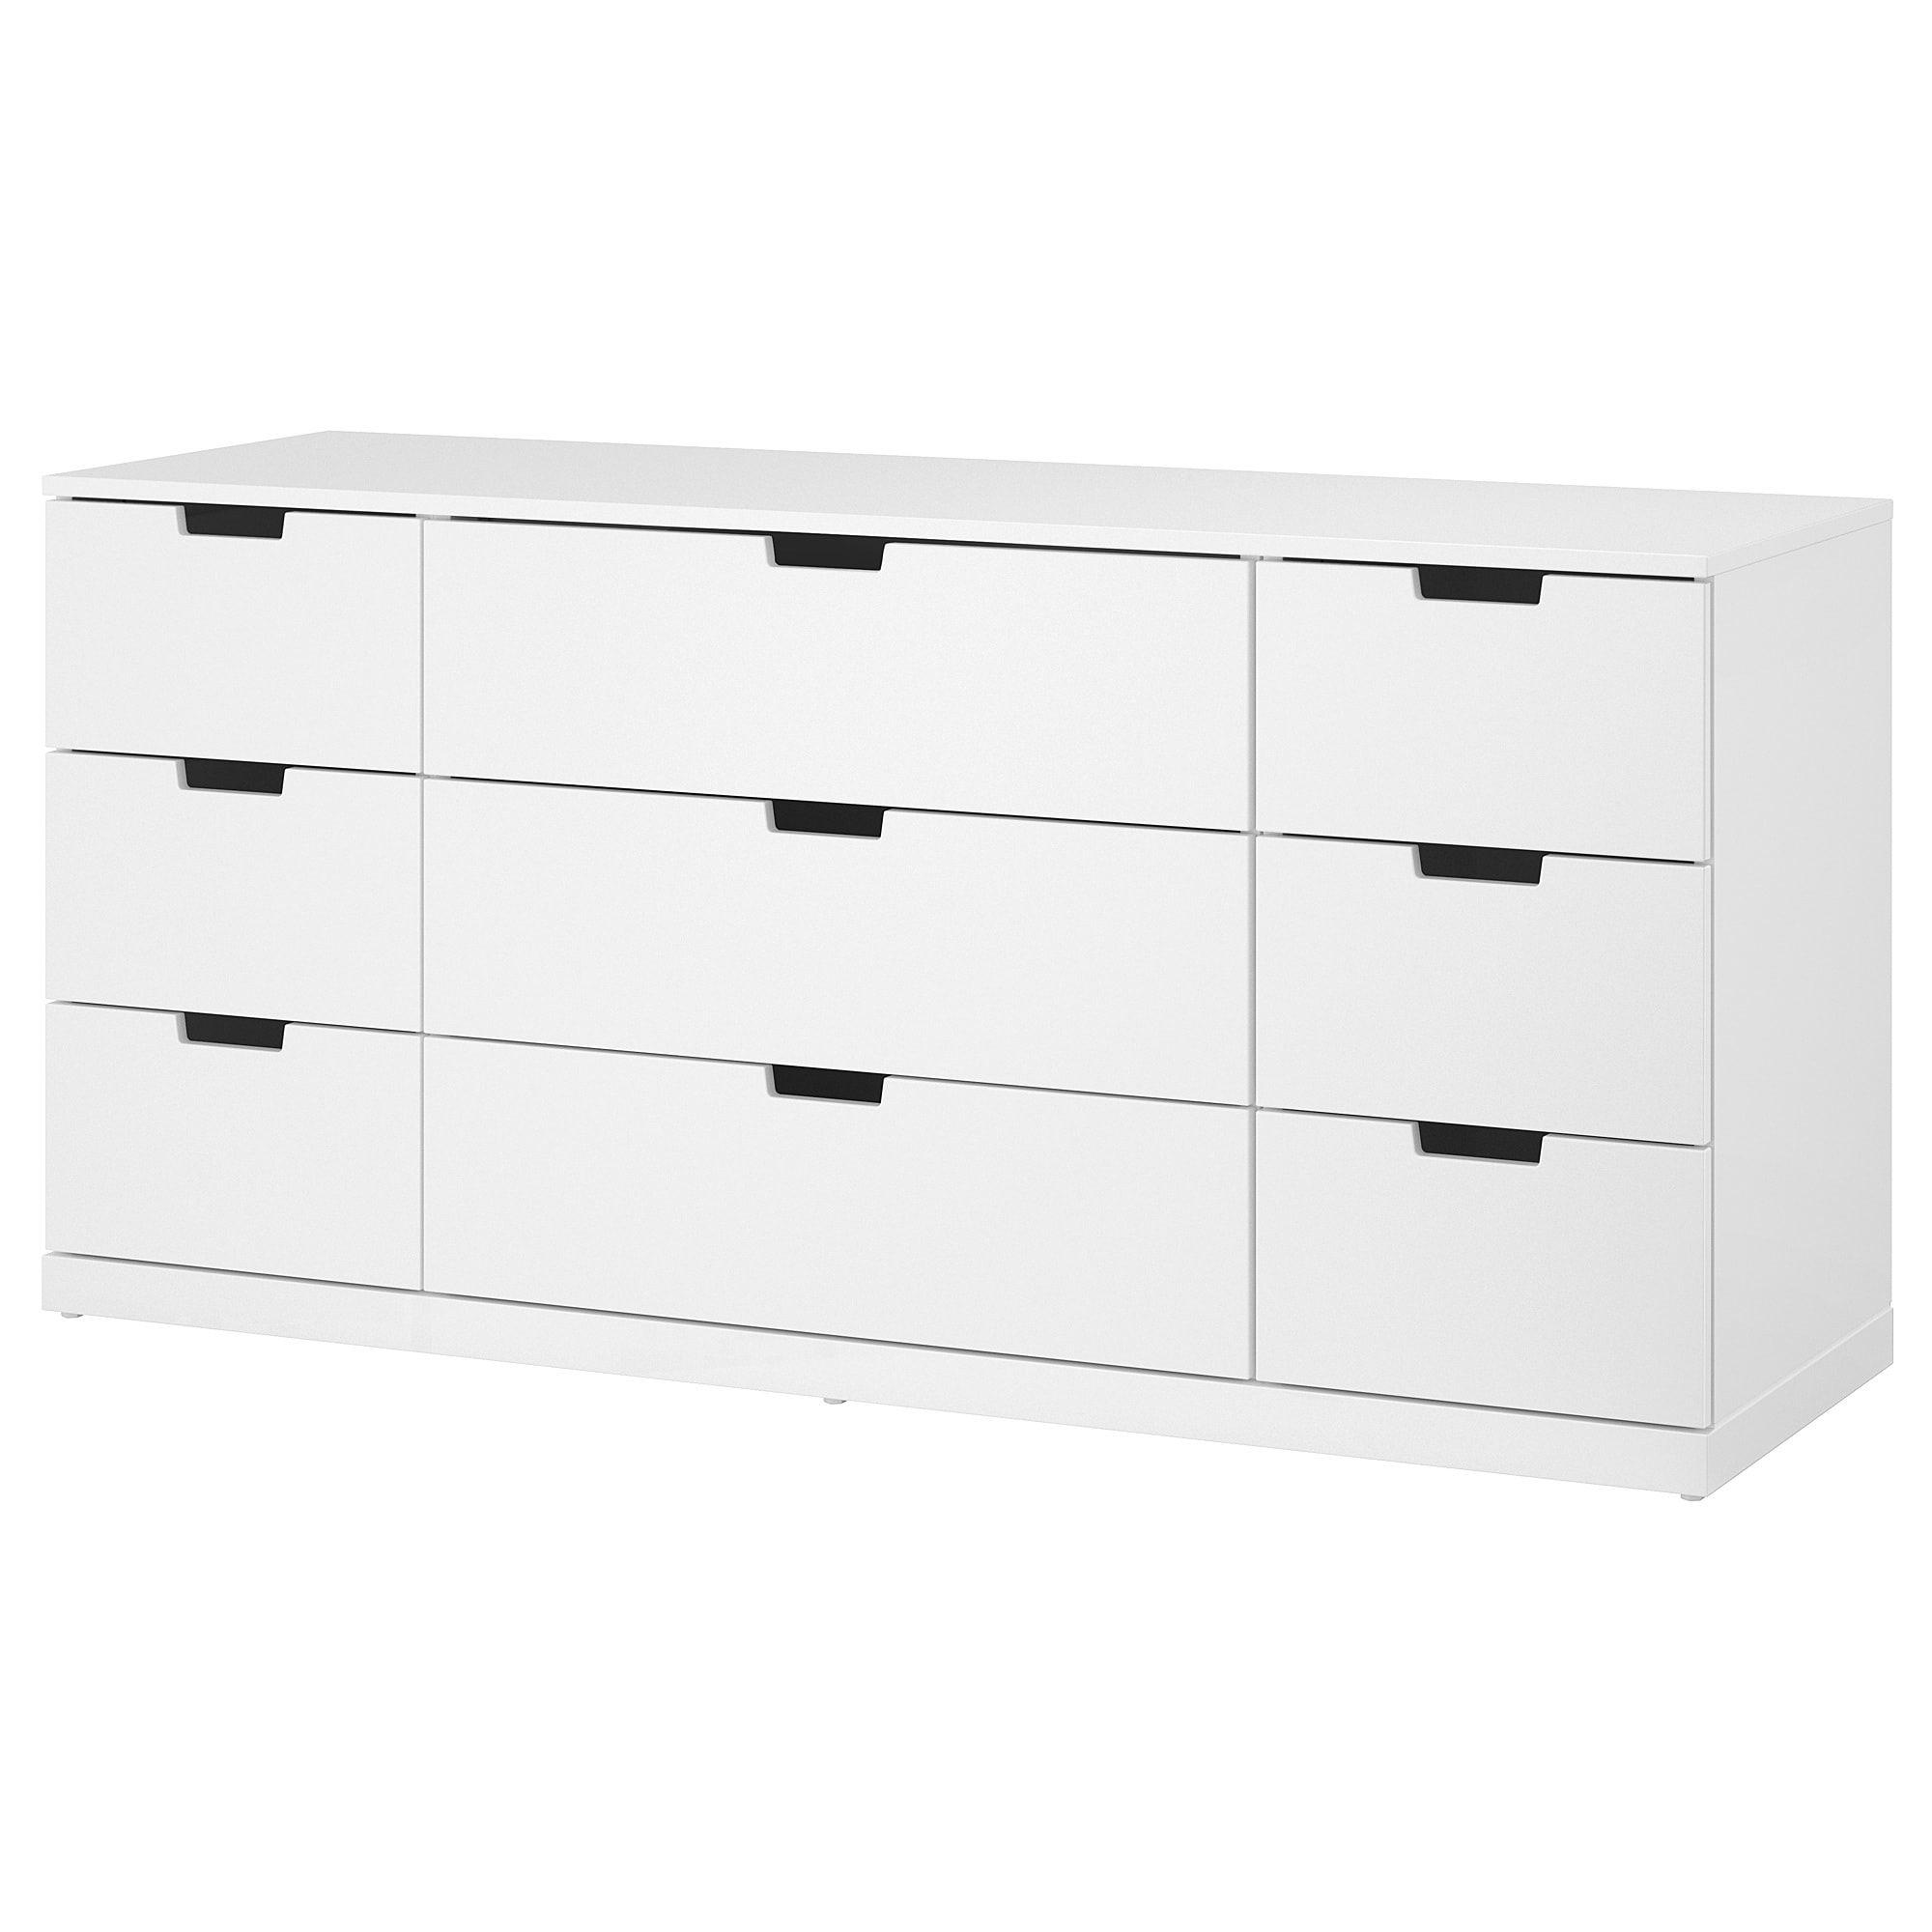 Ikea Us Furniture And Home Furnishings Ikea Nordli Chest Of Drawers Ikea